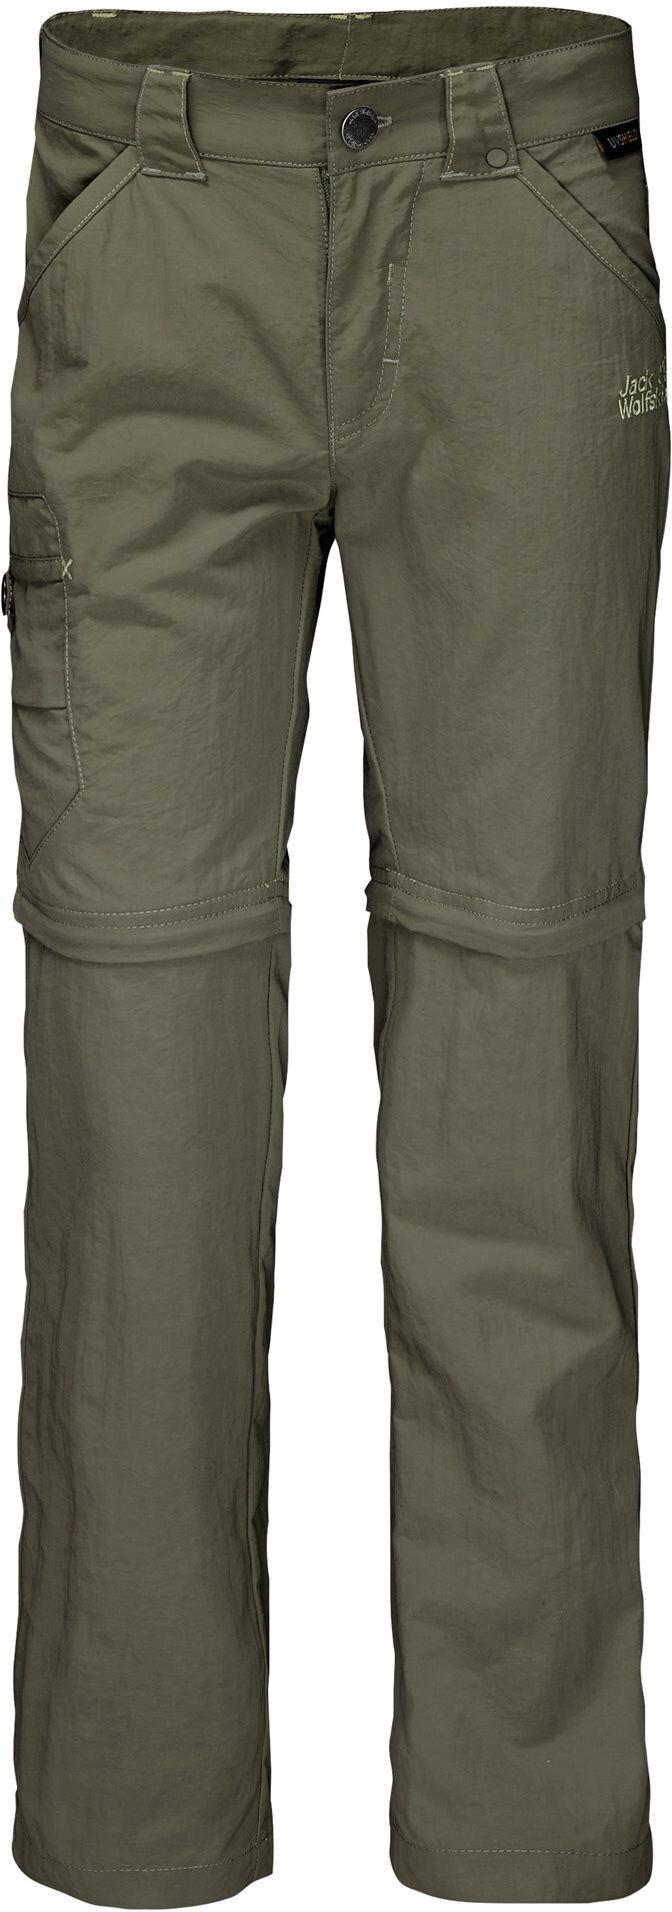 5dea4036 Jack Wolfskin Safari Zip-Off Pants Børn, woodland green | Find ...